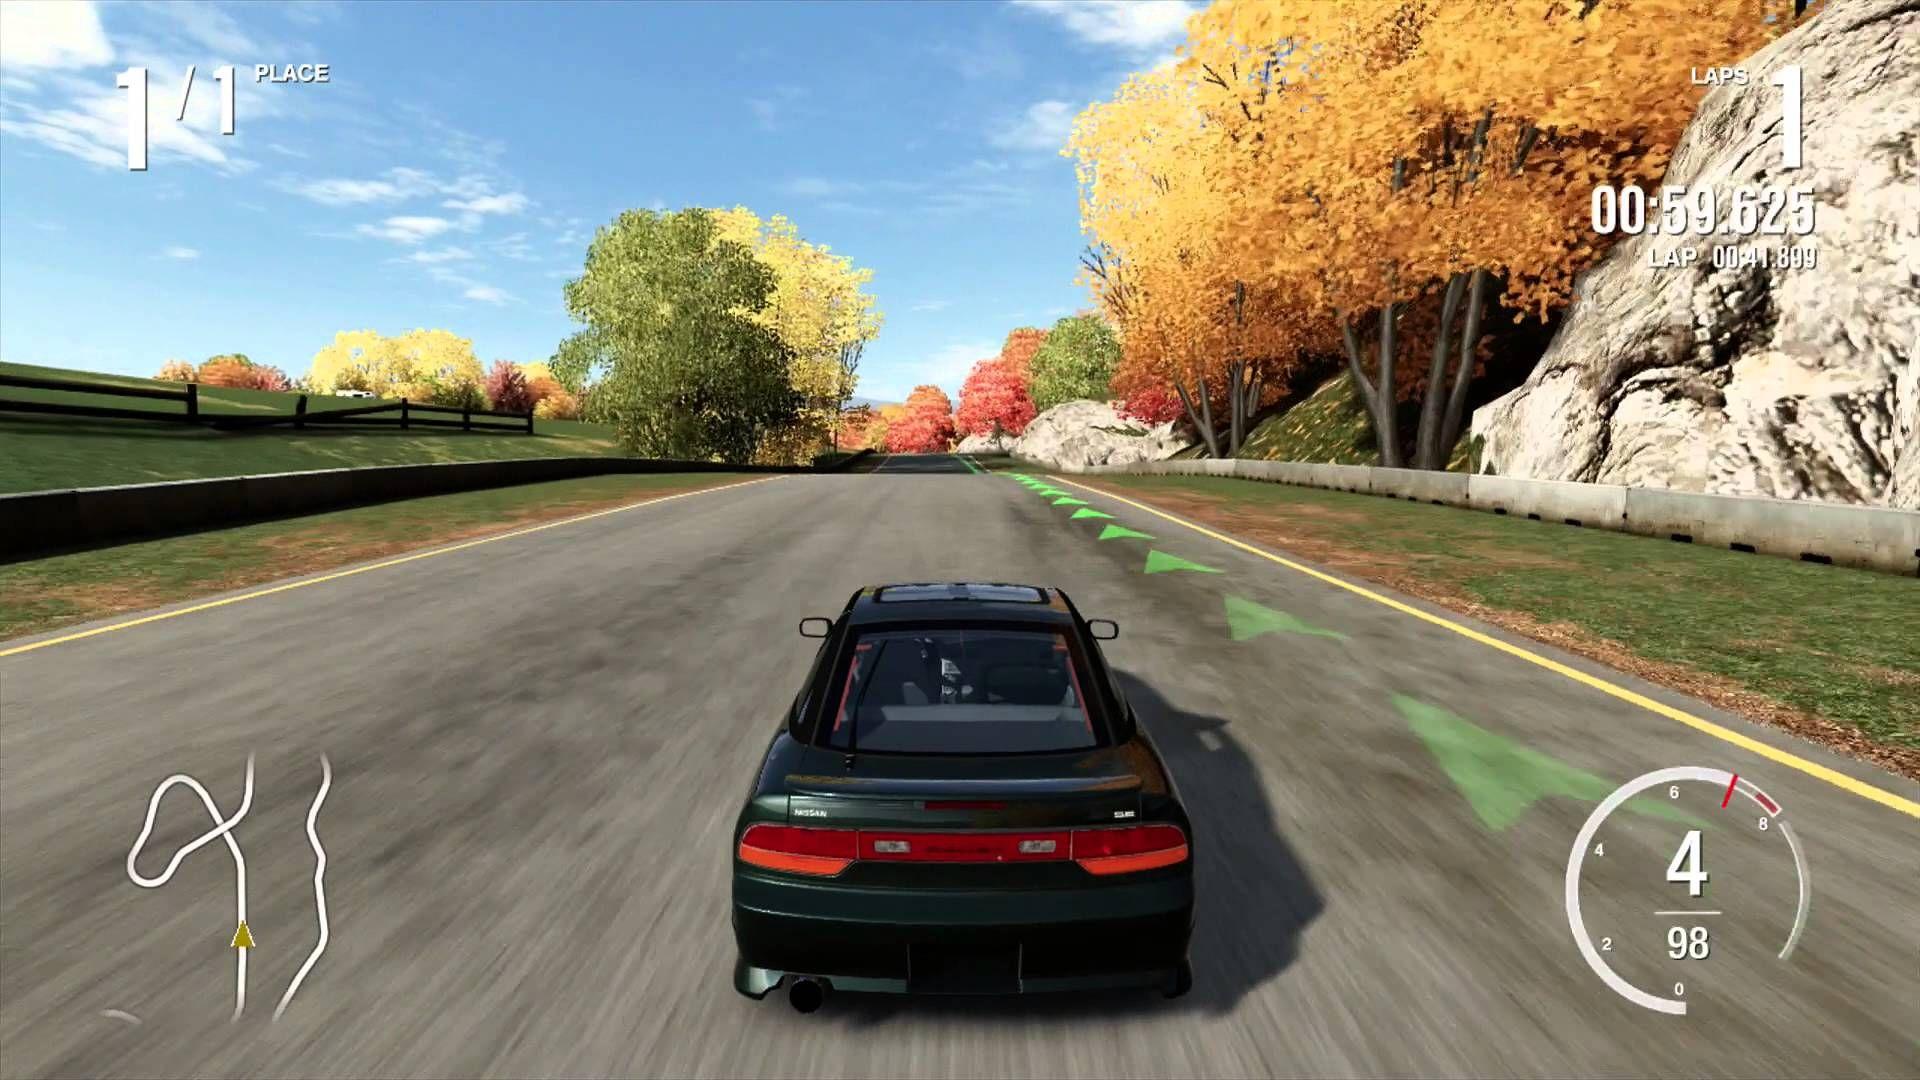 Build A Car Game >> Build Your Own Car Game 5953 Car Used Car Reviews Car